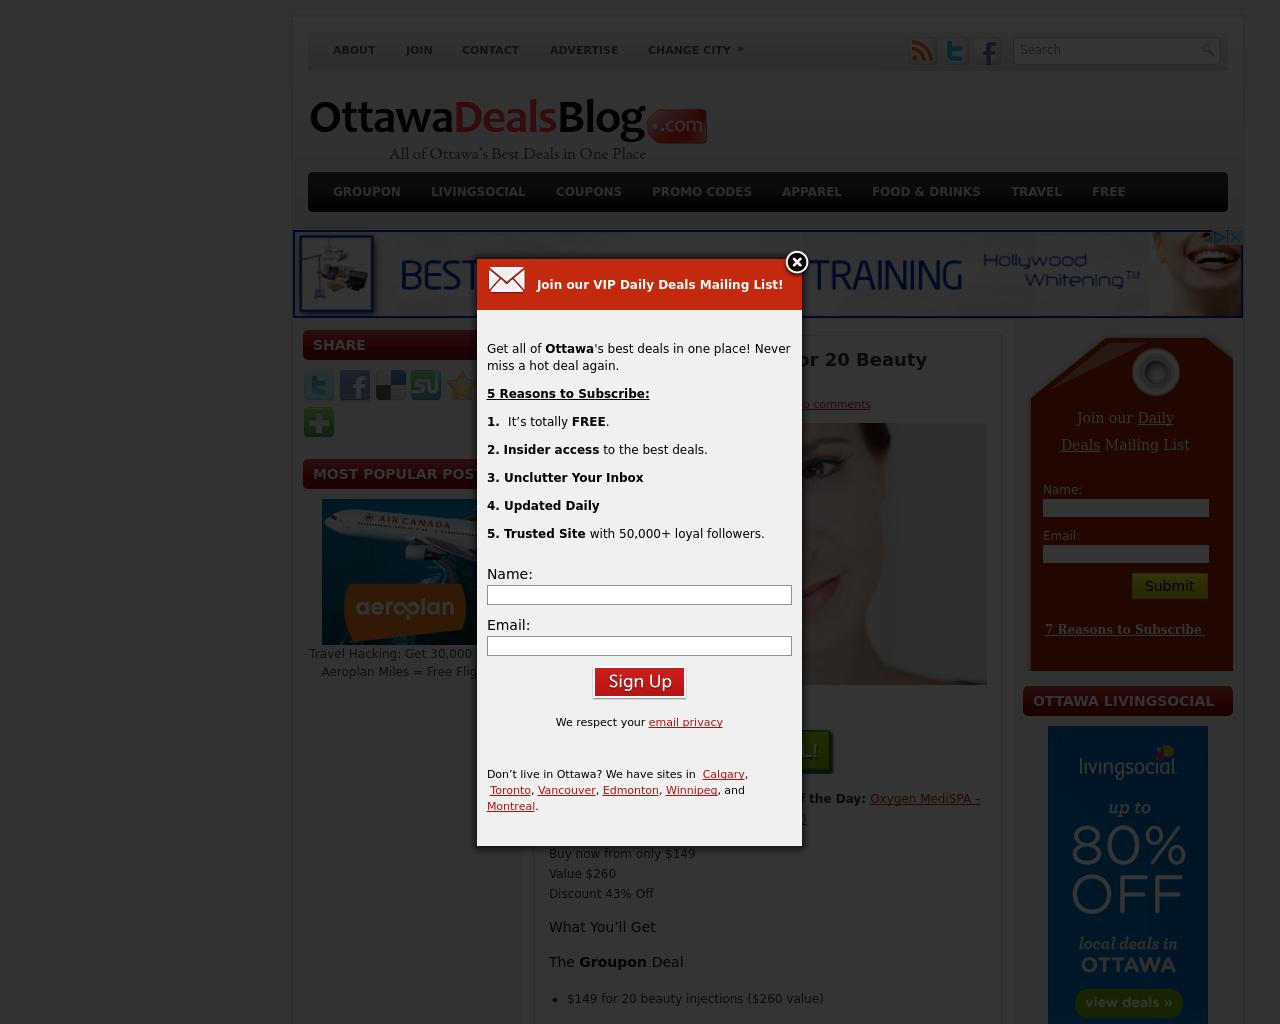 Ottawa-Deals-Blog-Advertising-Reviews-Pricing